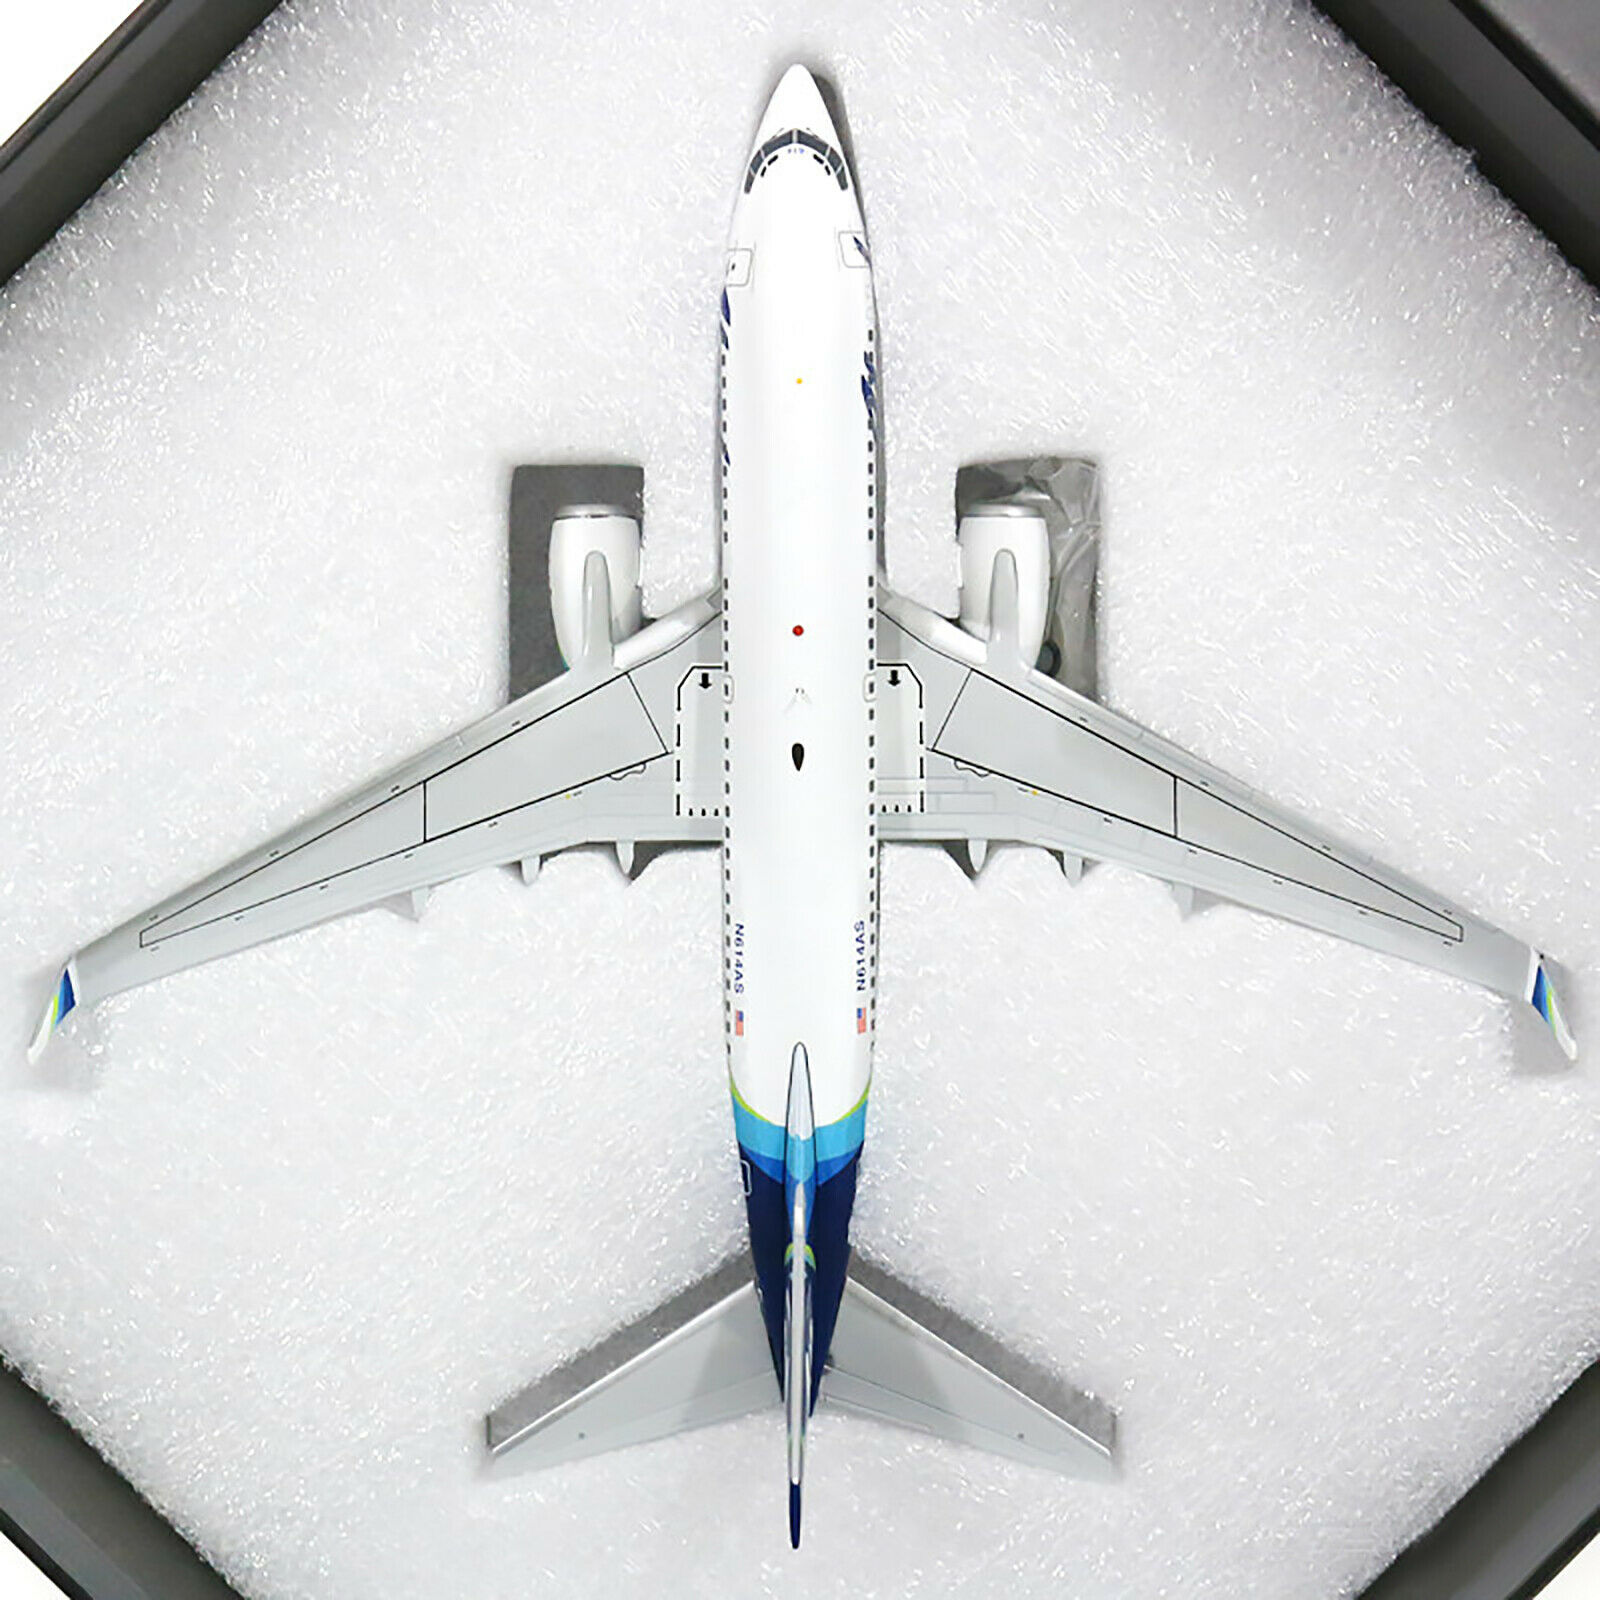 Gemini200 Alaska Boeing 737-700 New New New Livery G2ASA778 1 200, N614AS. New f19aaa